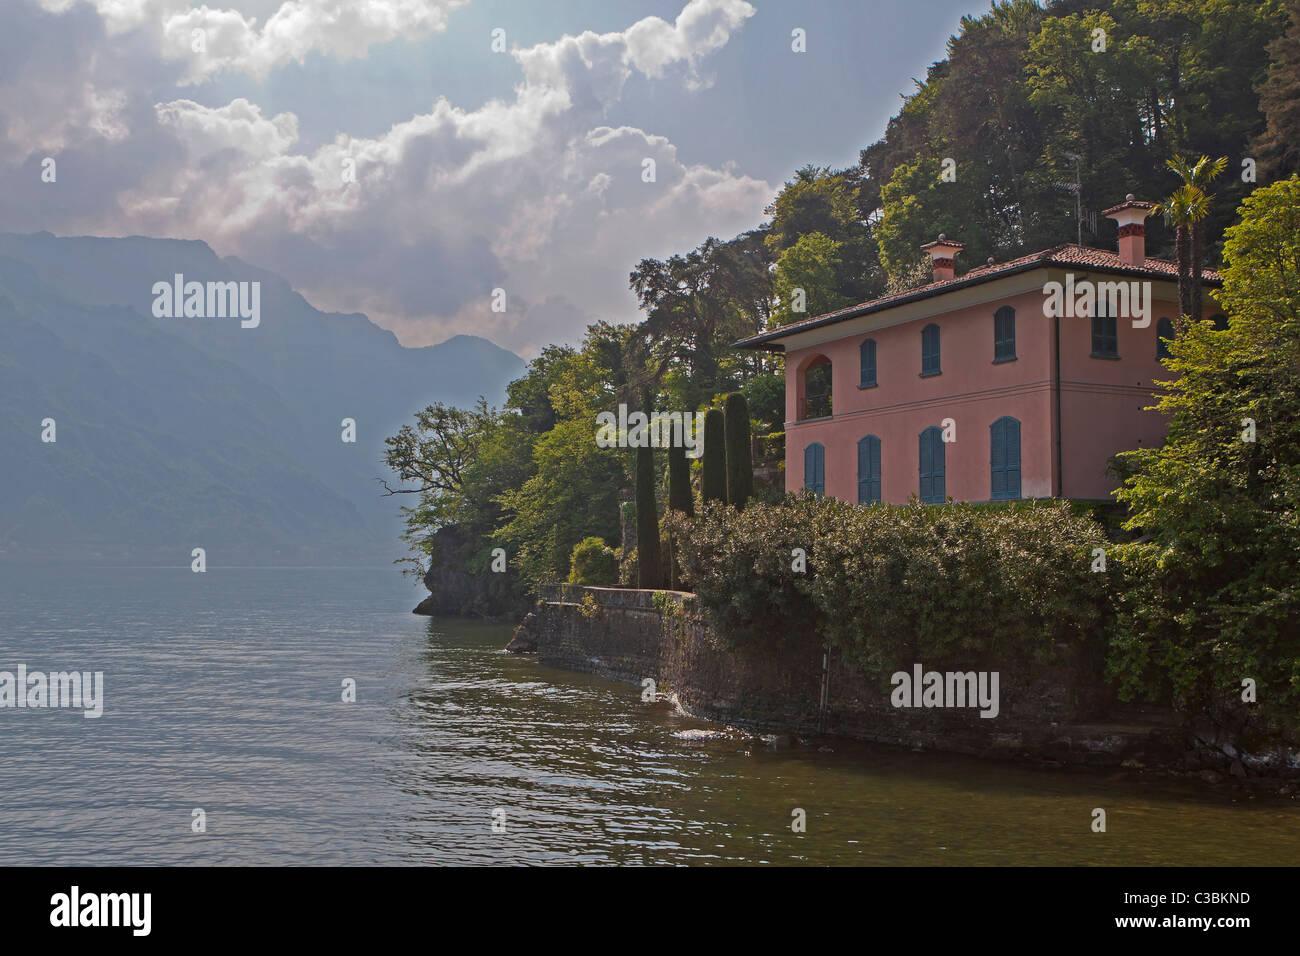 Berühmtes Dorf bin Lago di Como Stockbild